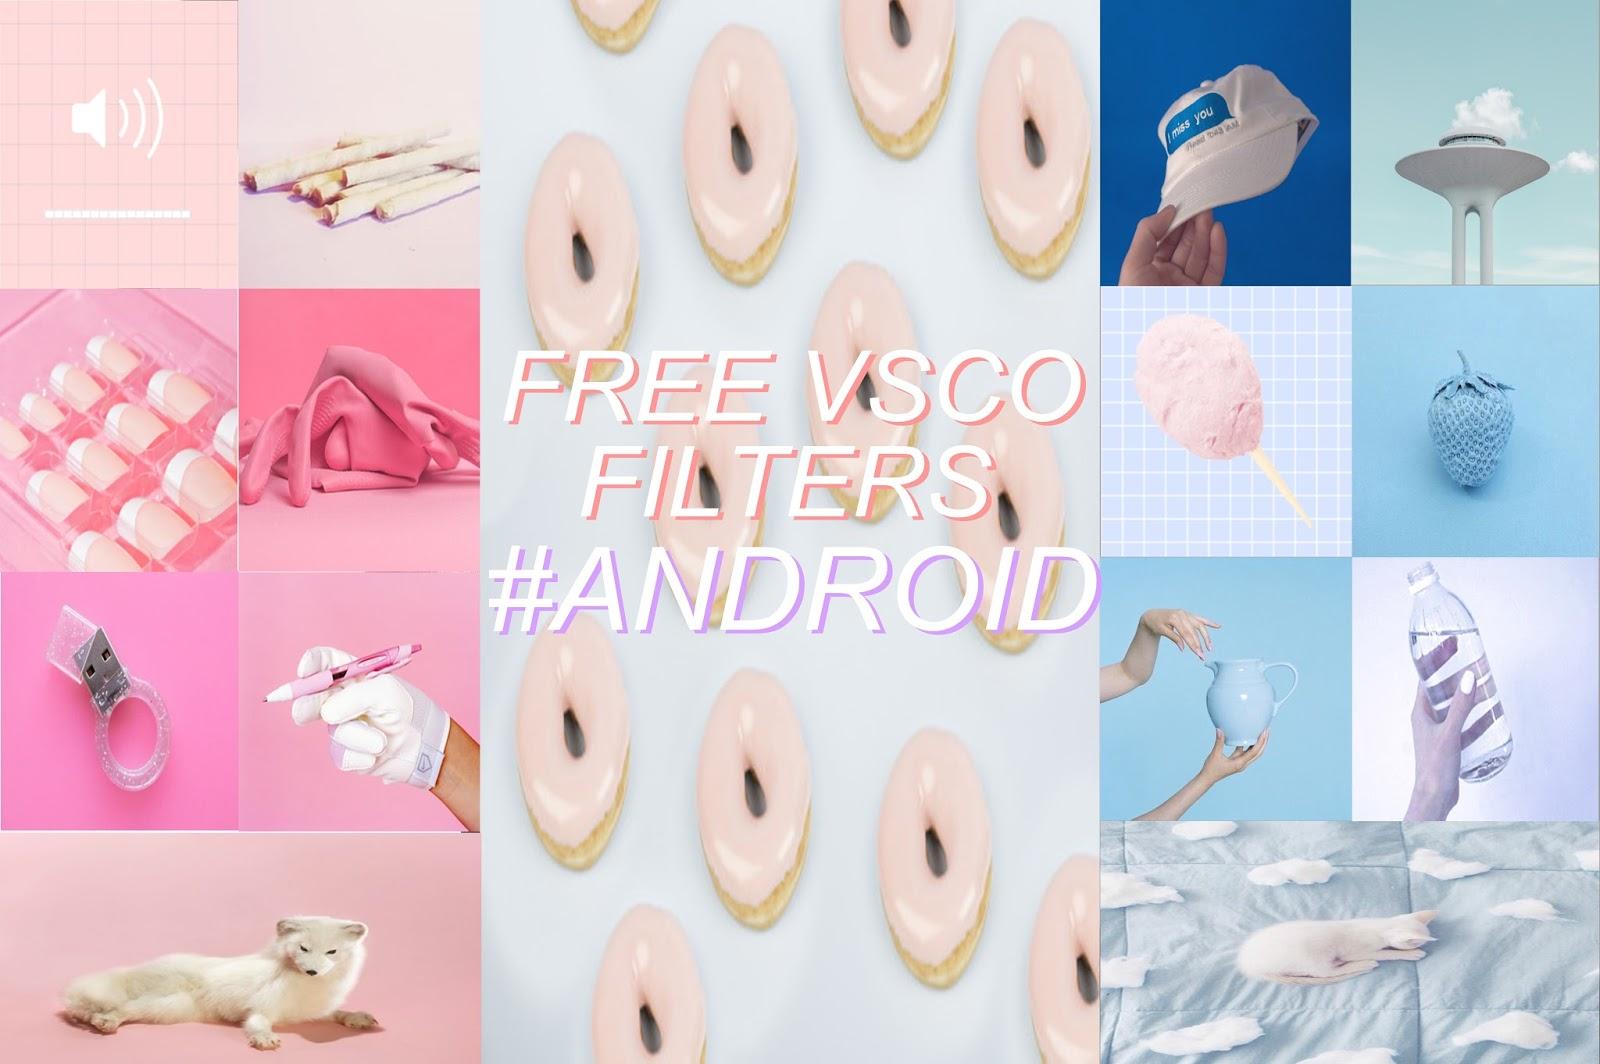 FREE VSCO FILTERS FOR ANDROID | Fsyazana